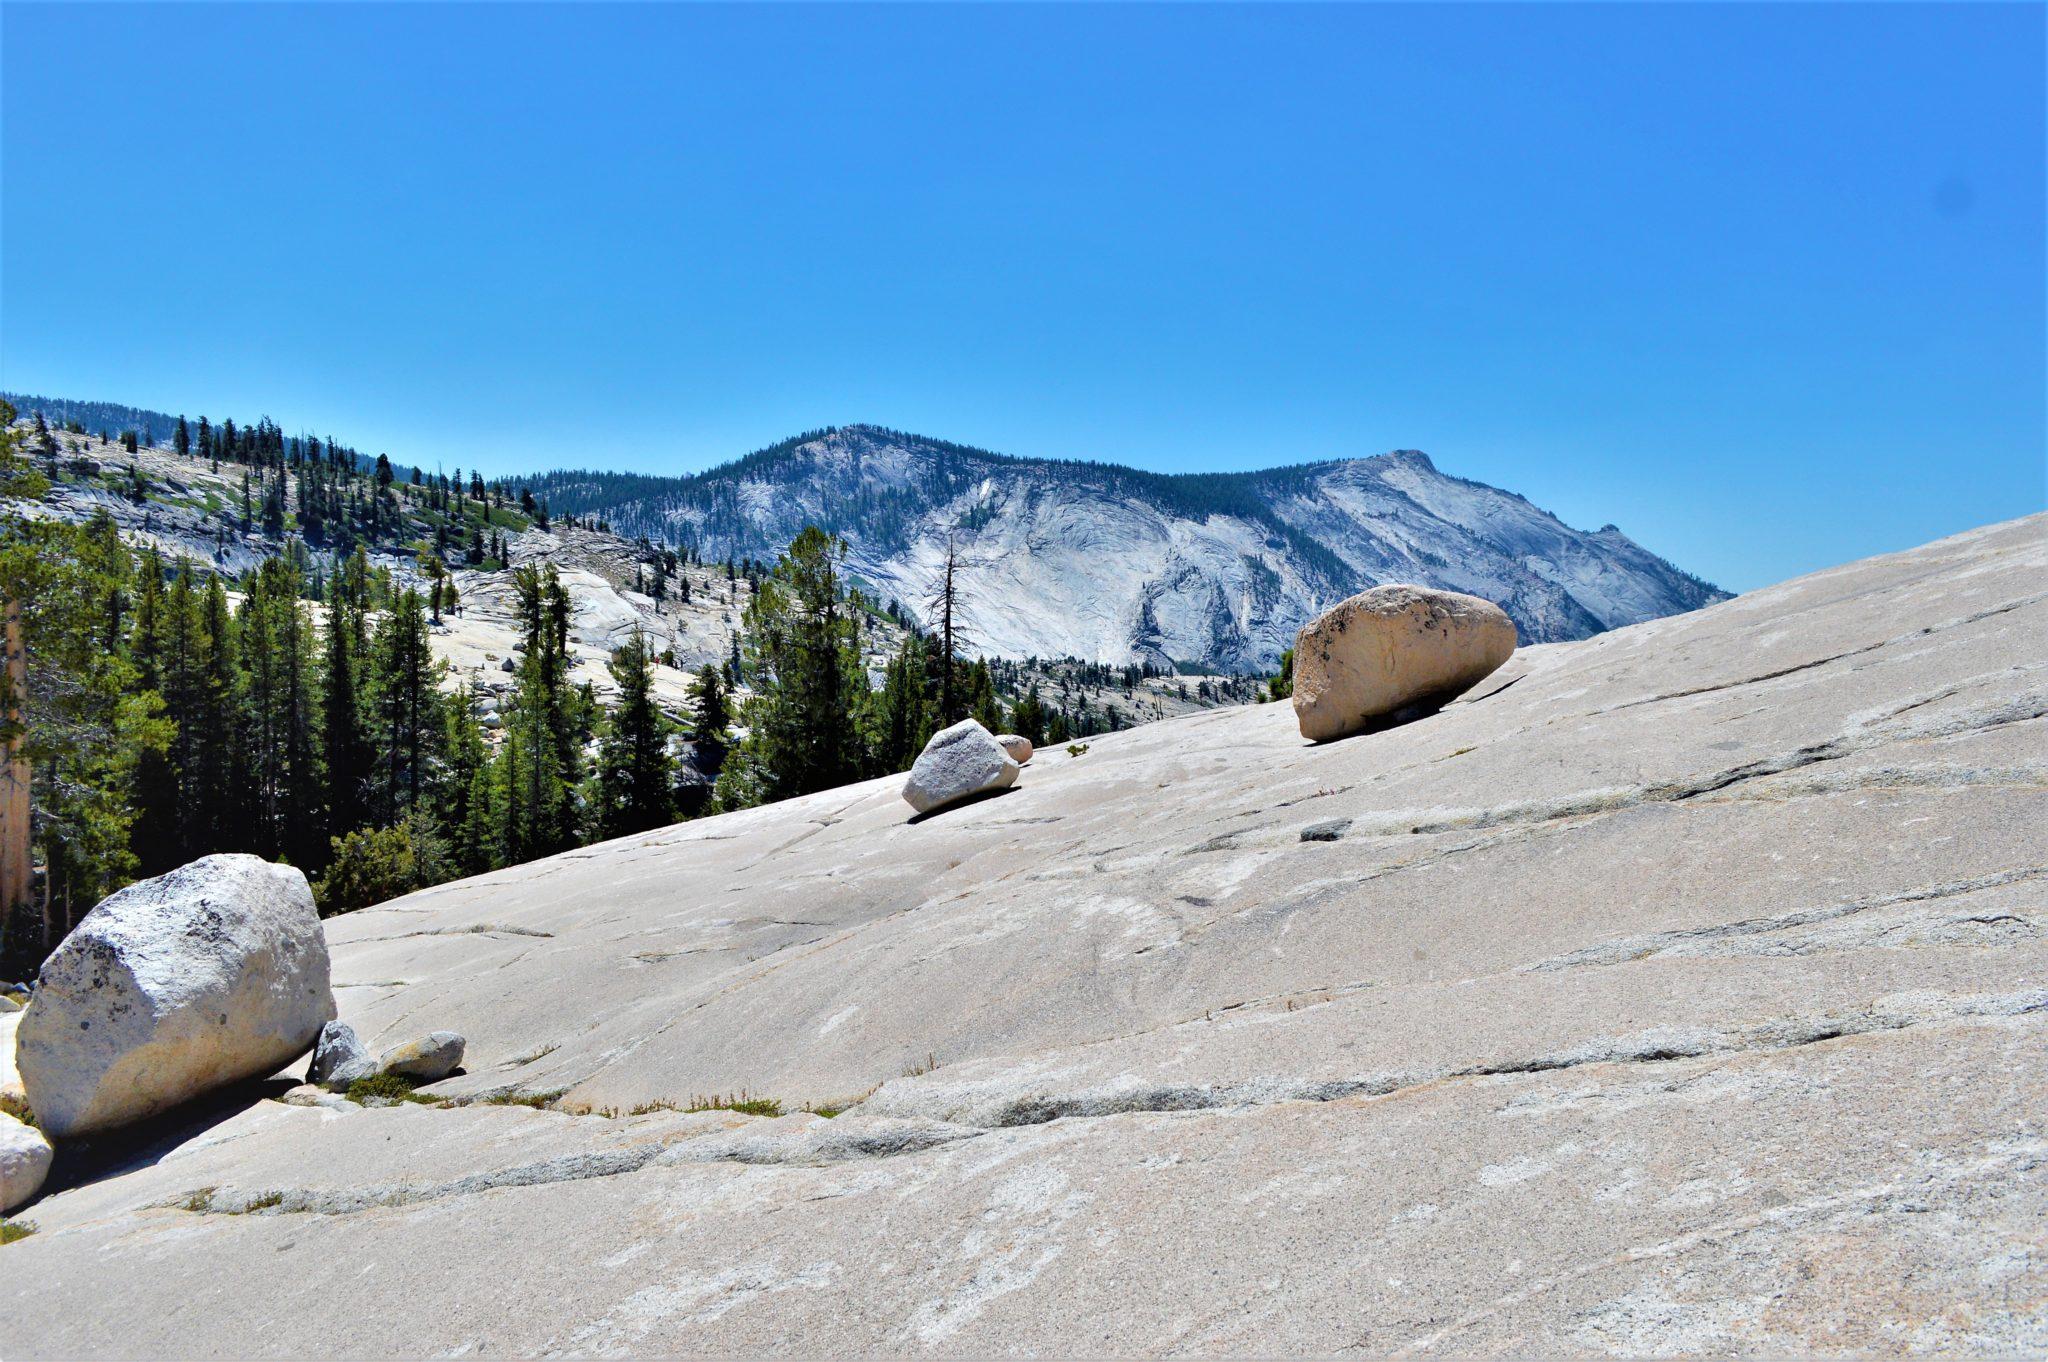 Cliff climbing, Yosemite National Park, California, things to do at yosemite